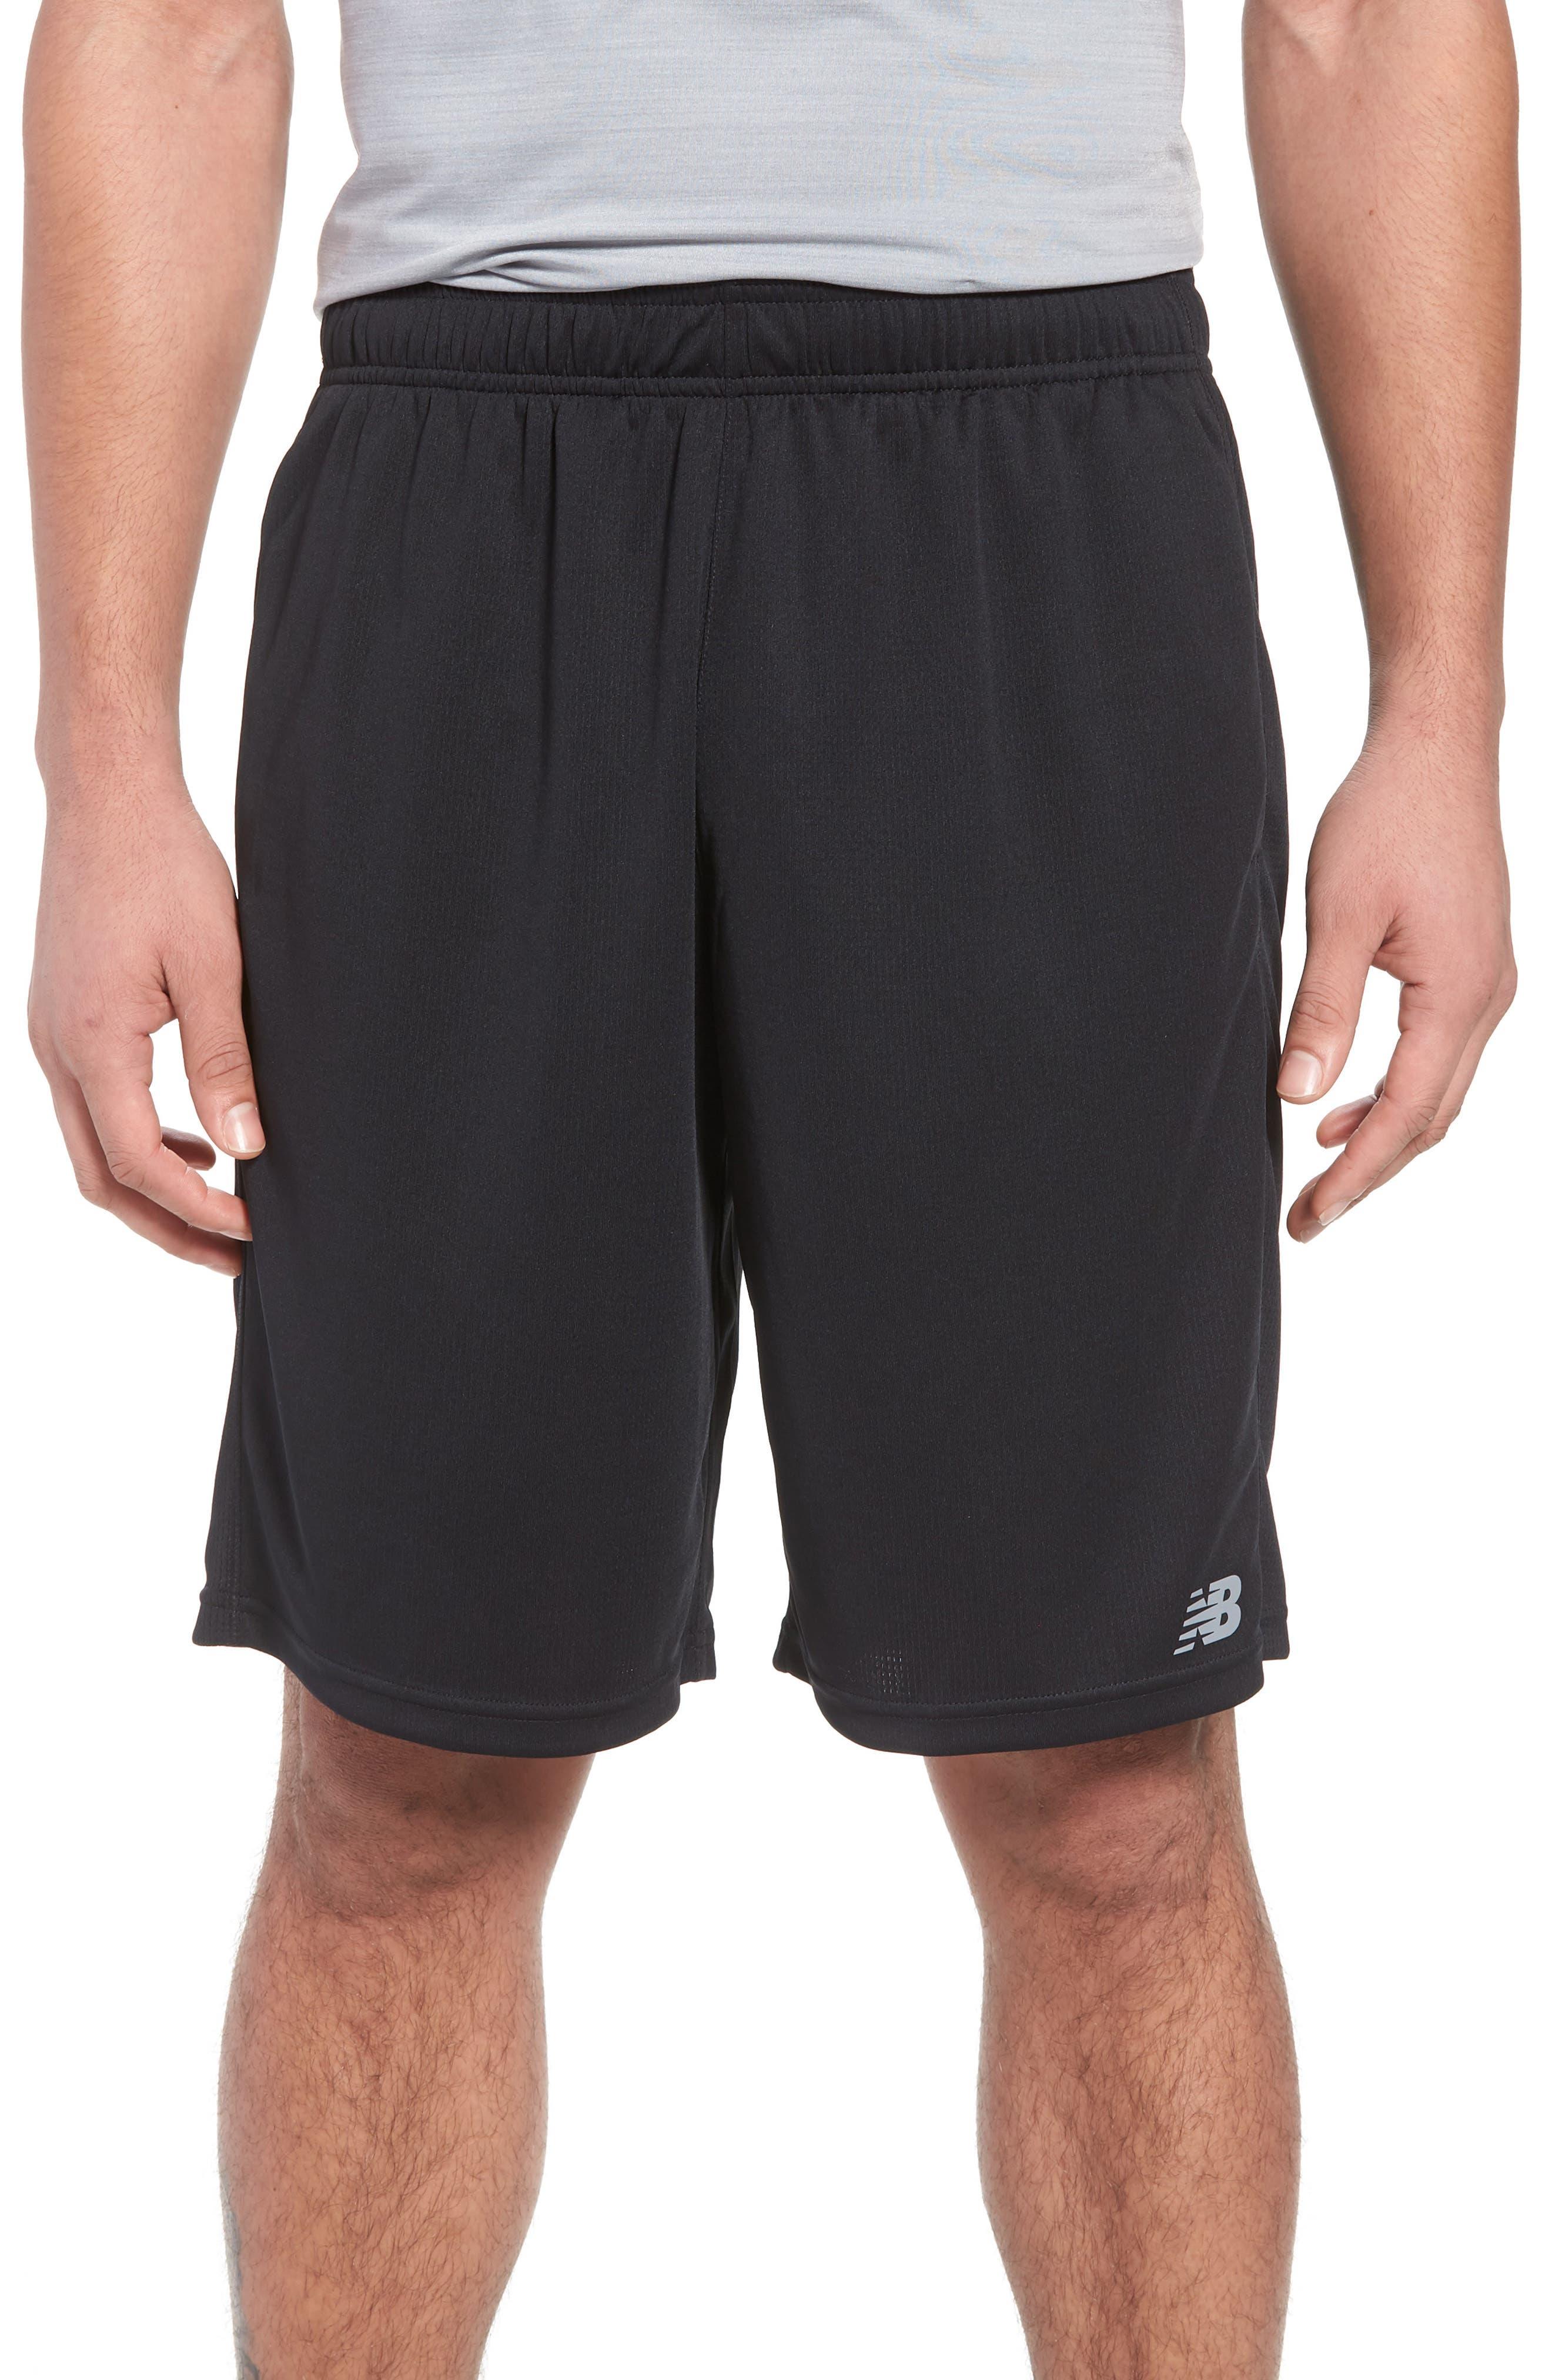 Versa Shorts,                         Main,                         color, BLACK